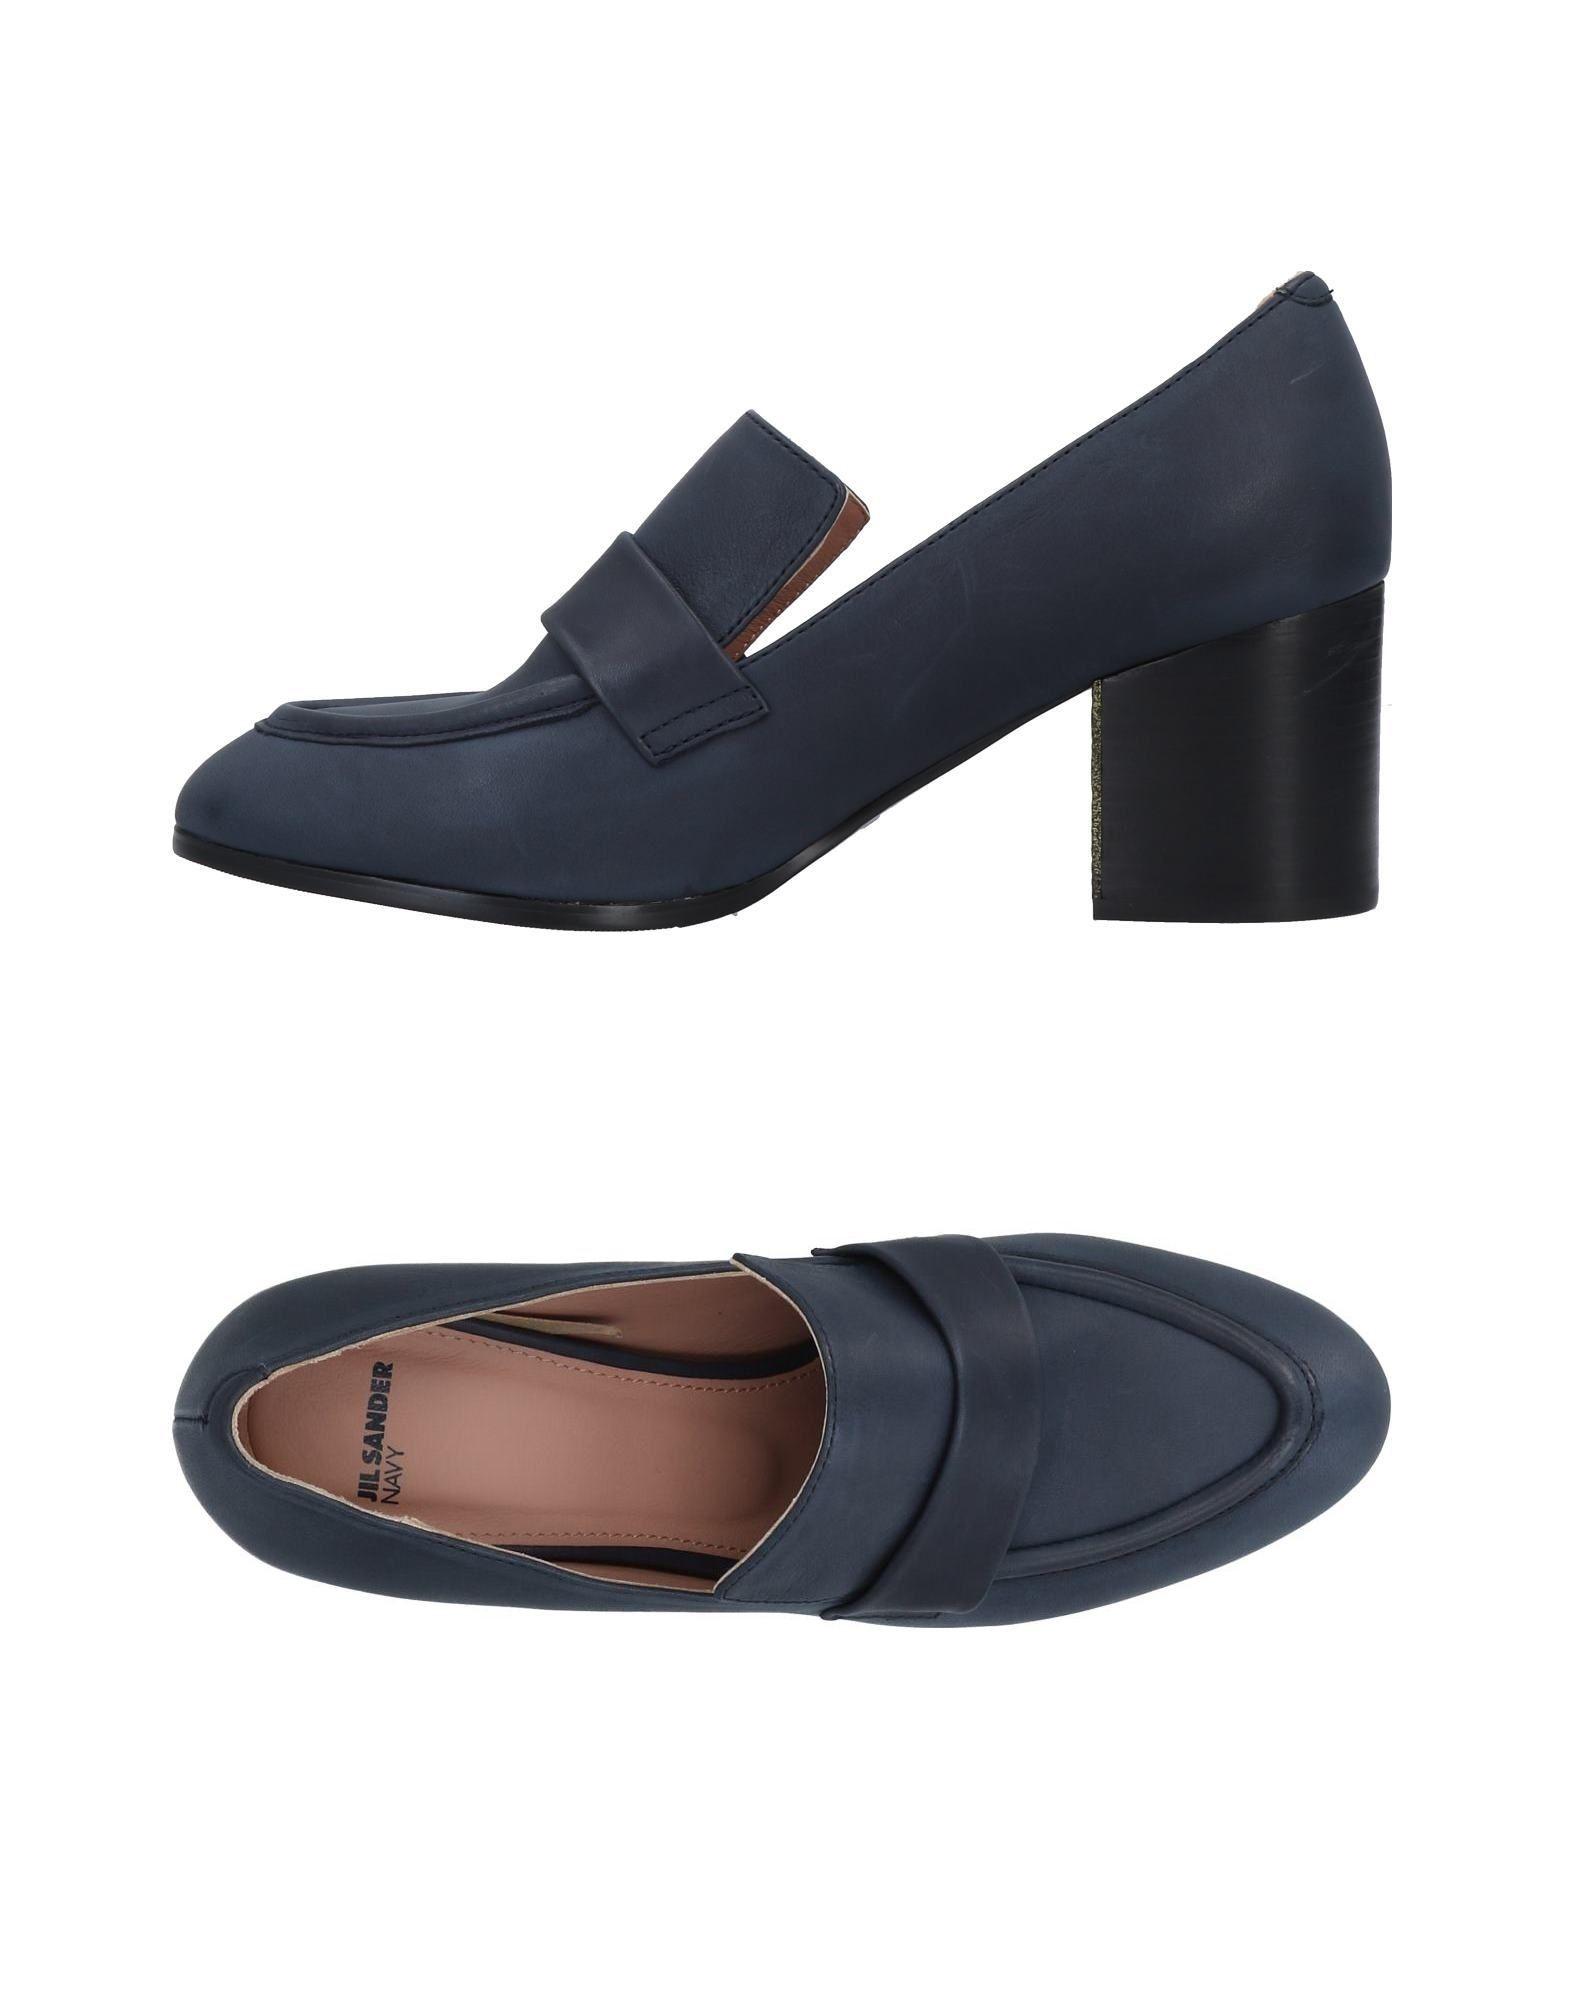 Stilvolle billige Schuhe Jil Sander Navy Mokassins Damen  11492067VJ